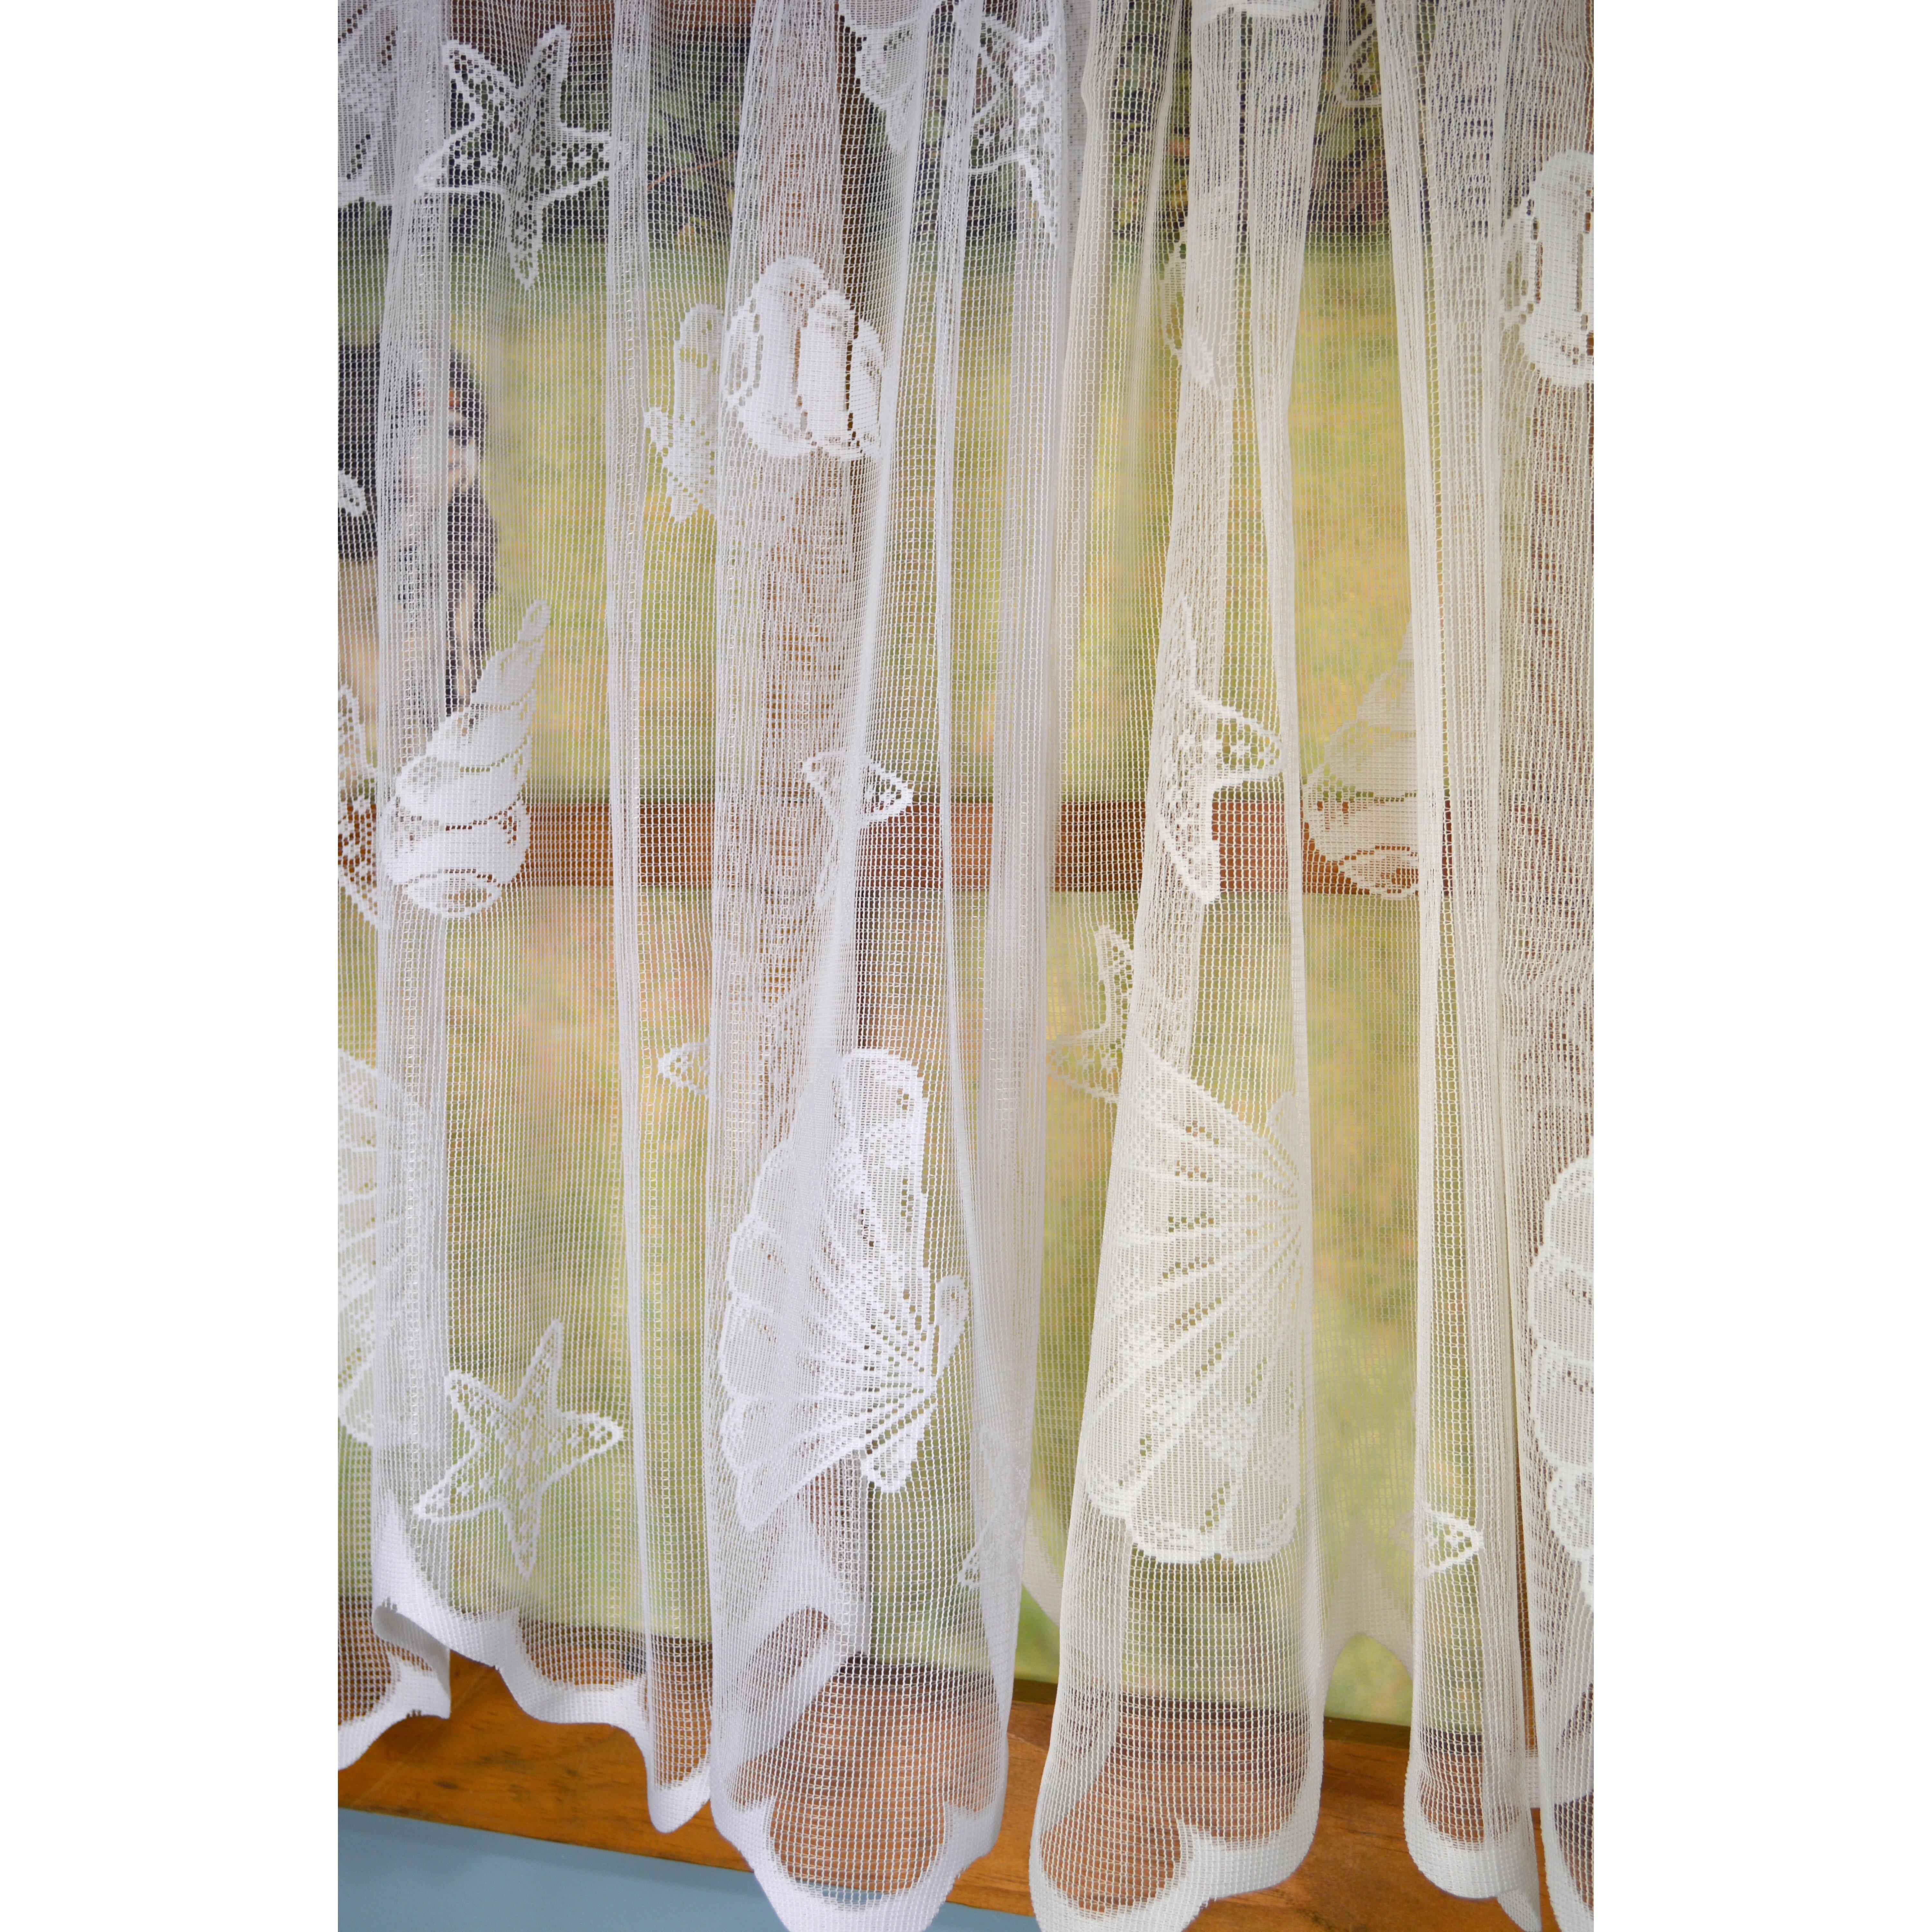 "Curtain Chic Seashell Lace Scalloped Bottom 56"" Valance"